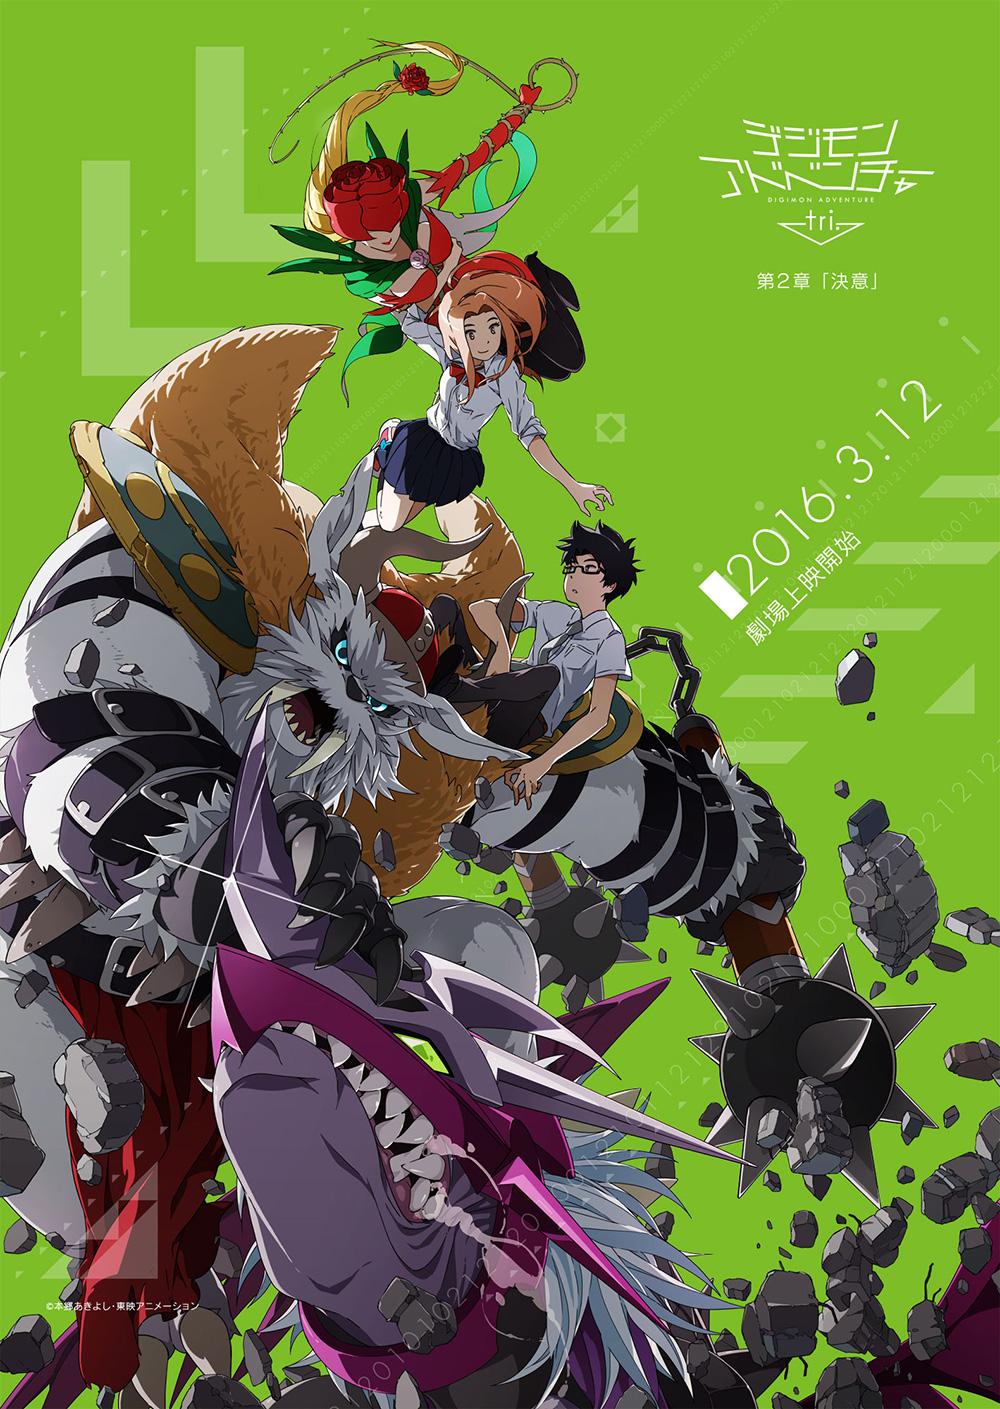 Digimon-Adventure-tri.-Chapter-2-Ketsui-Visual-v2